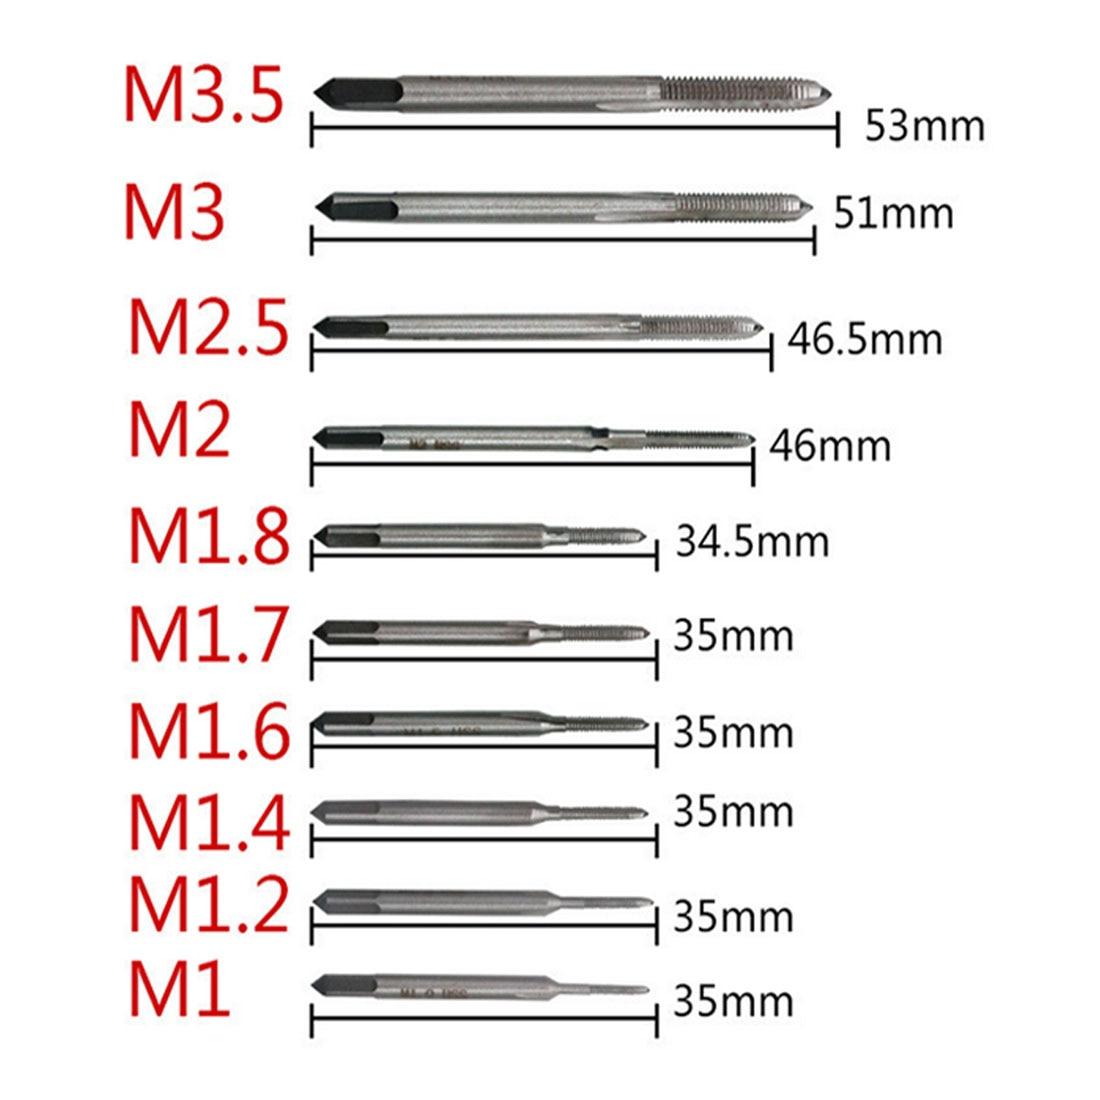 Free Shipping 10pcs/set Hand Tools Tap Thread Wire Tapping/Threading/Taps/Attack M1 M1.2 M1.4 M1.6 M1.7 M1.8 M2 M 2.5 M 3 M3.5